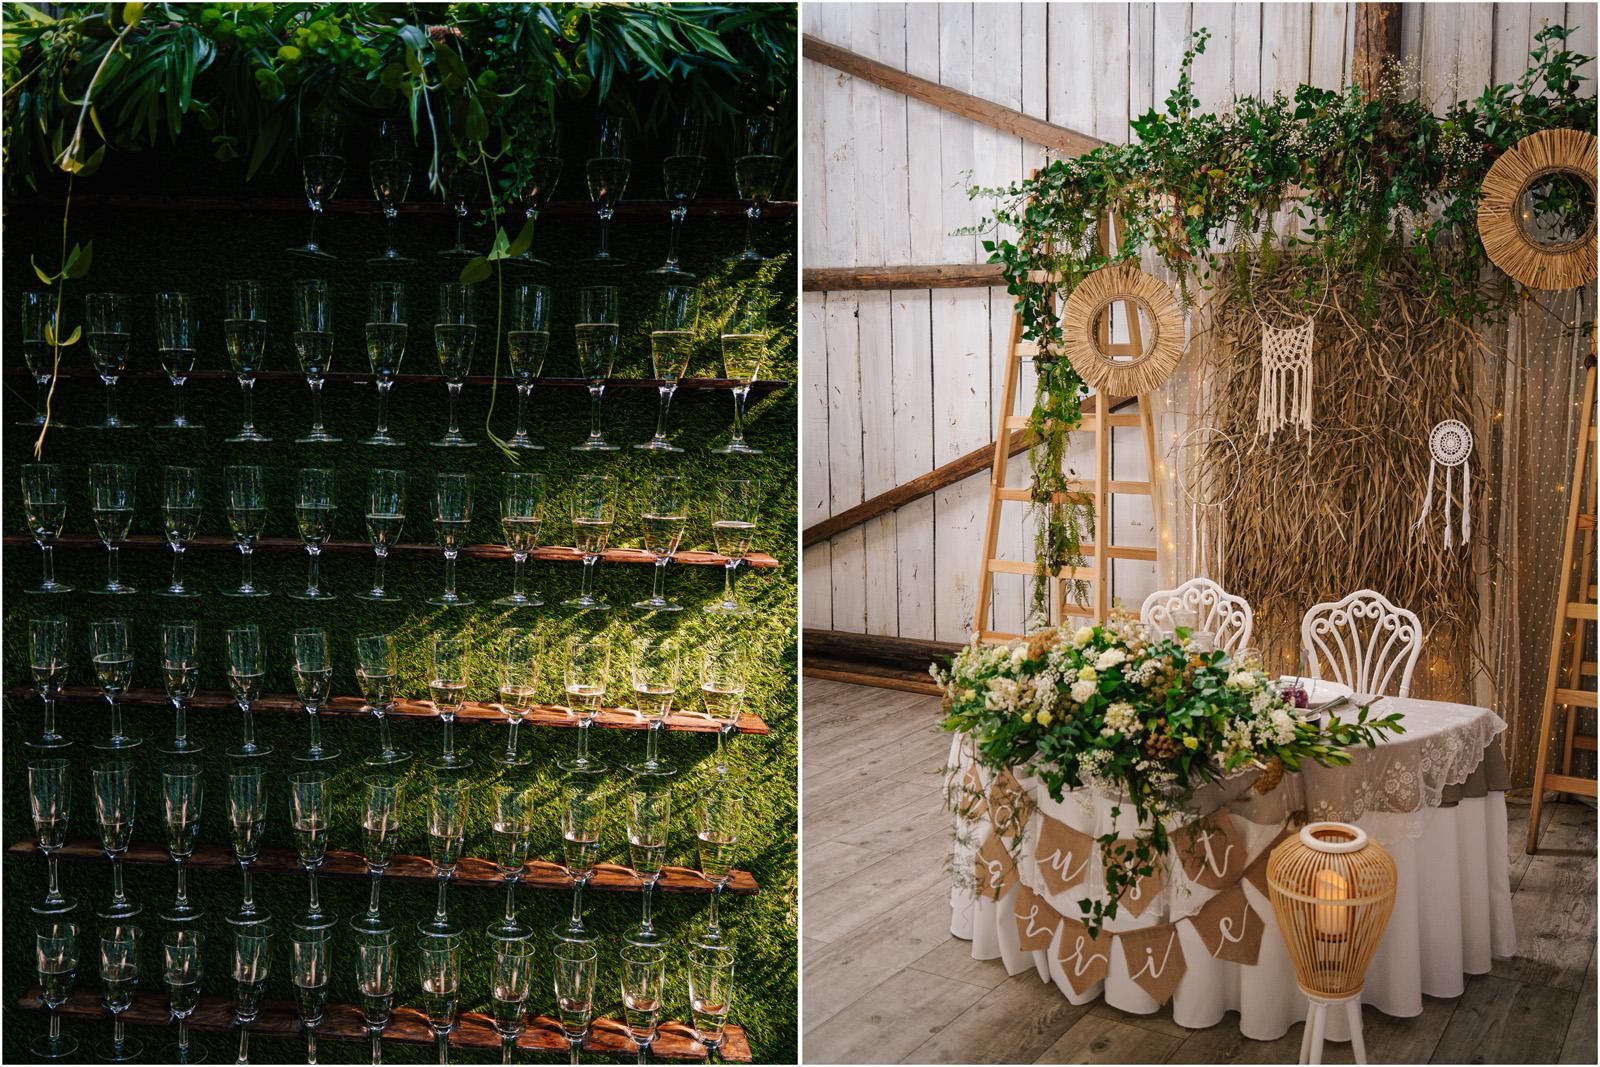 Ania & Mateusz | boho wesele w Stodole pod Kasztanami 67